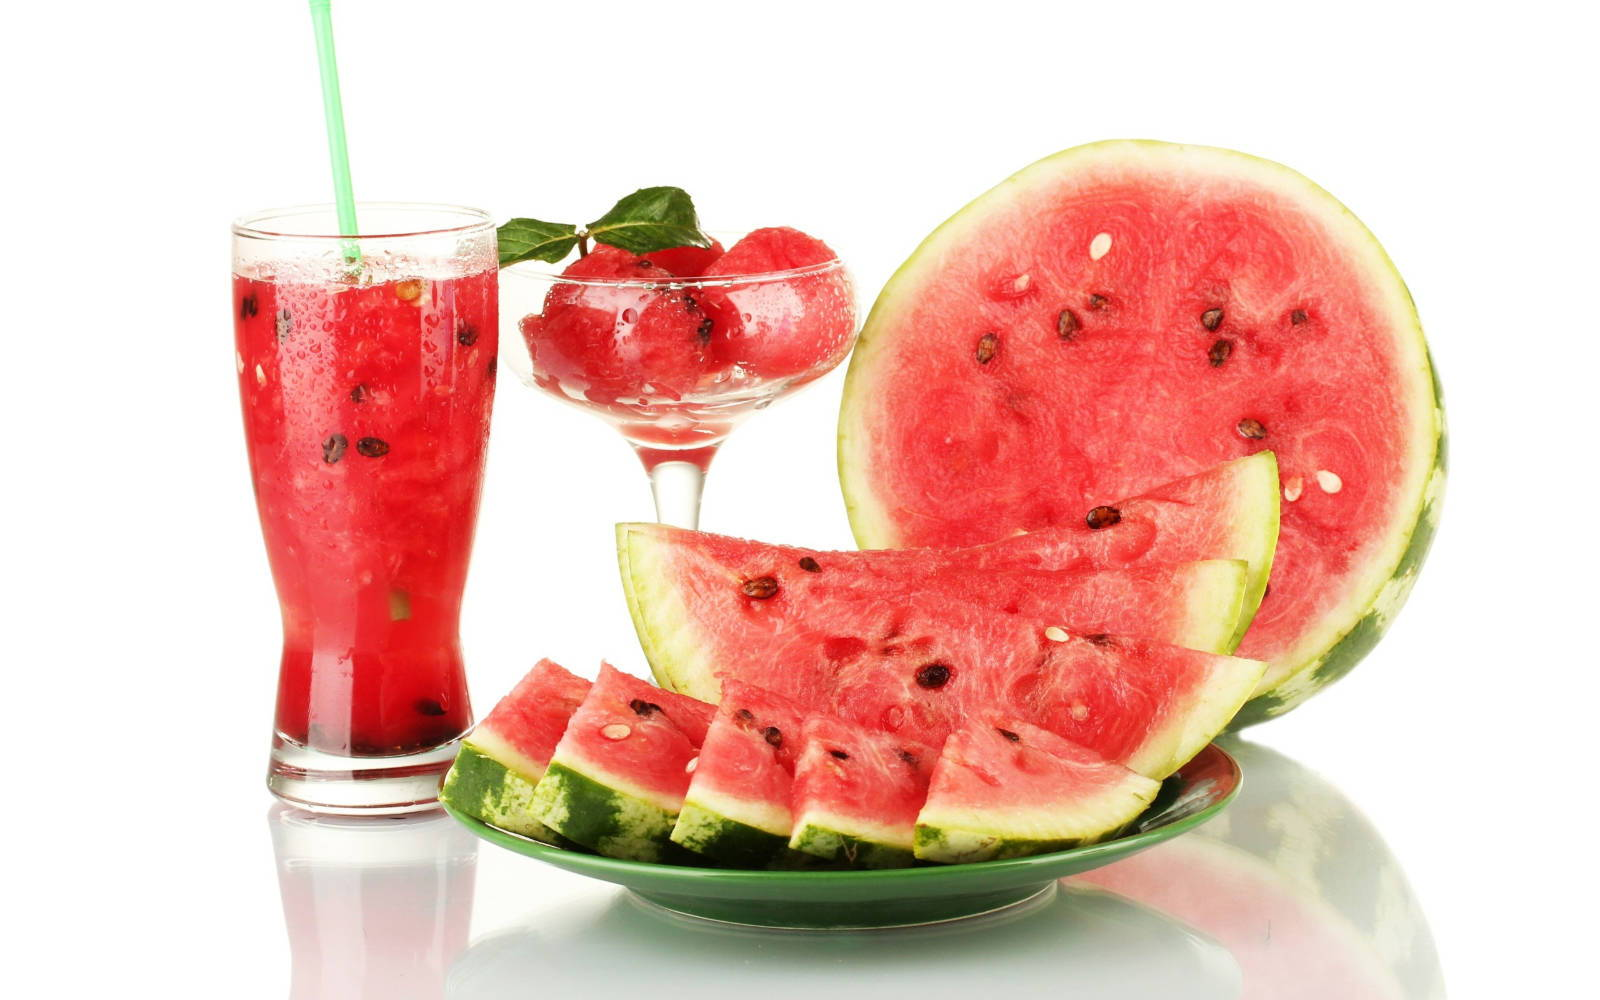 Watermelon-and-Watermelon-Juice